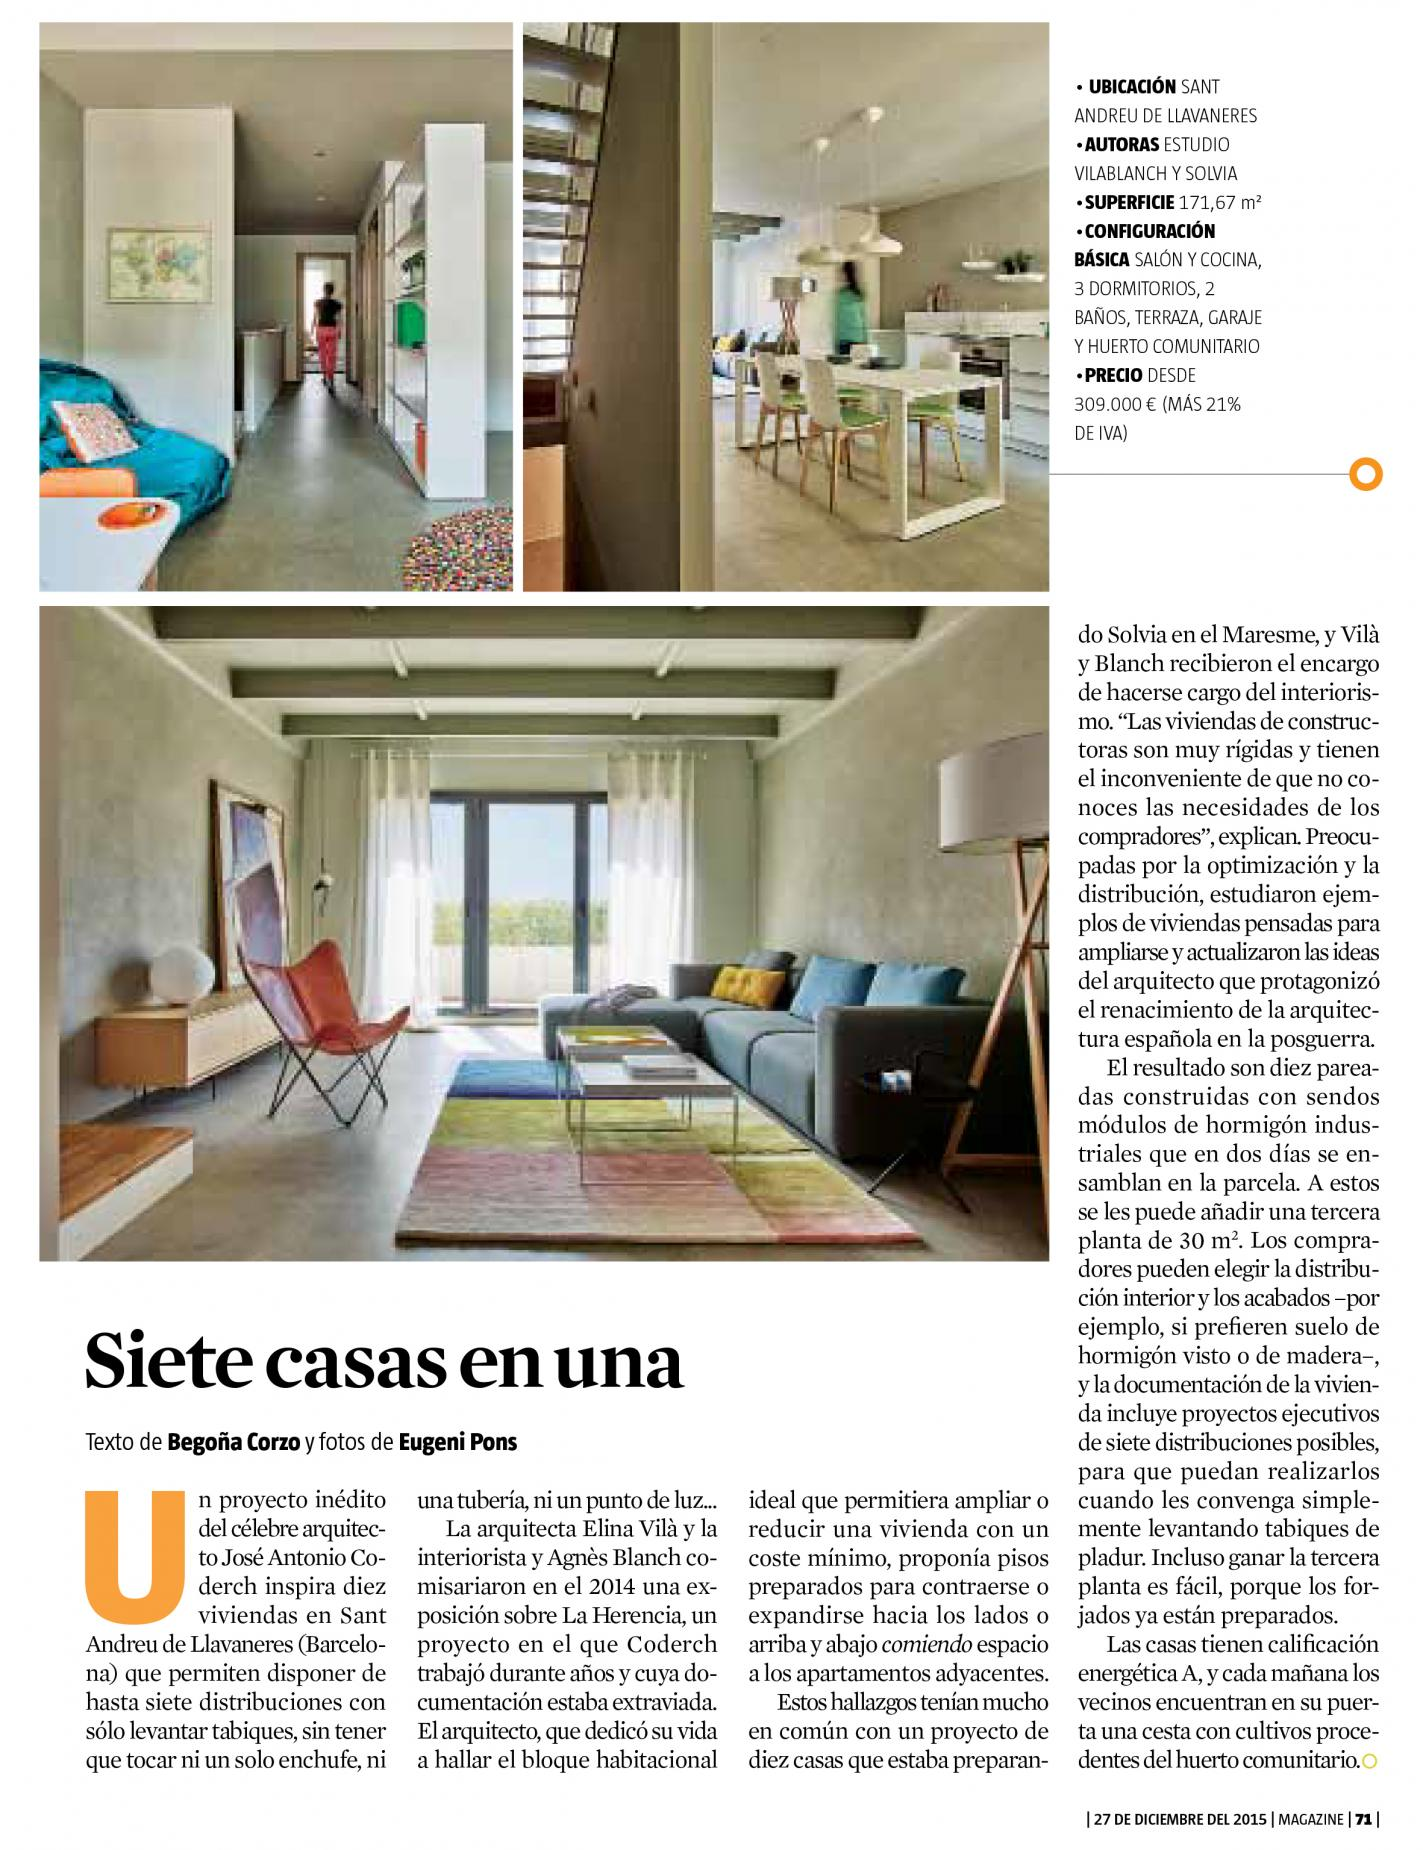 La Vanguardia · Magazine (dic. 2015)